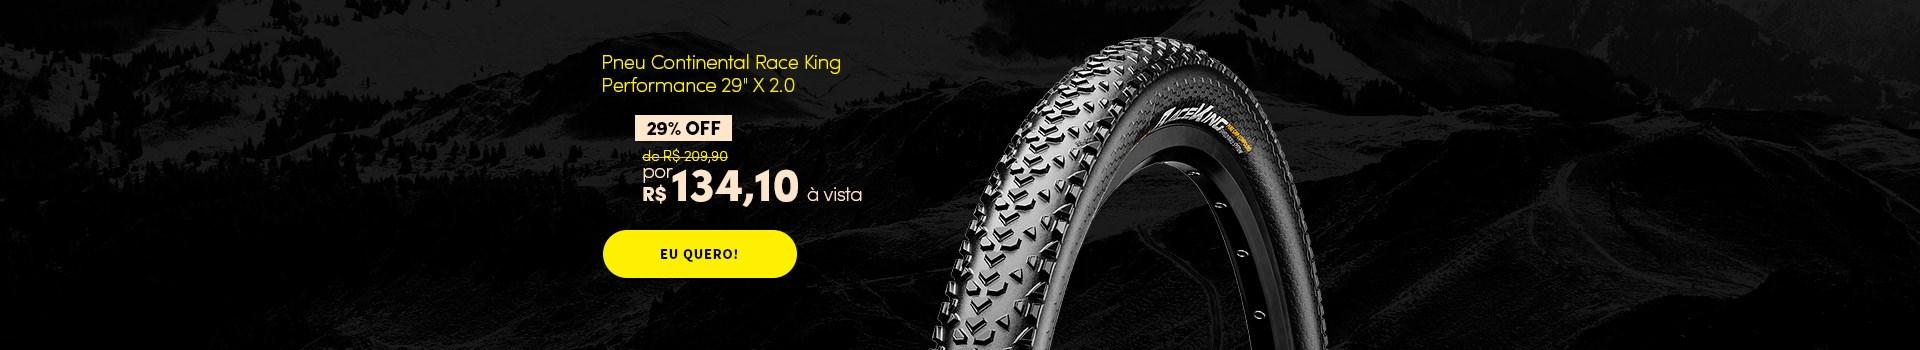 "Promoção Pneu Continental Race King  Performance 29"" X 2.0"